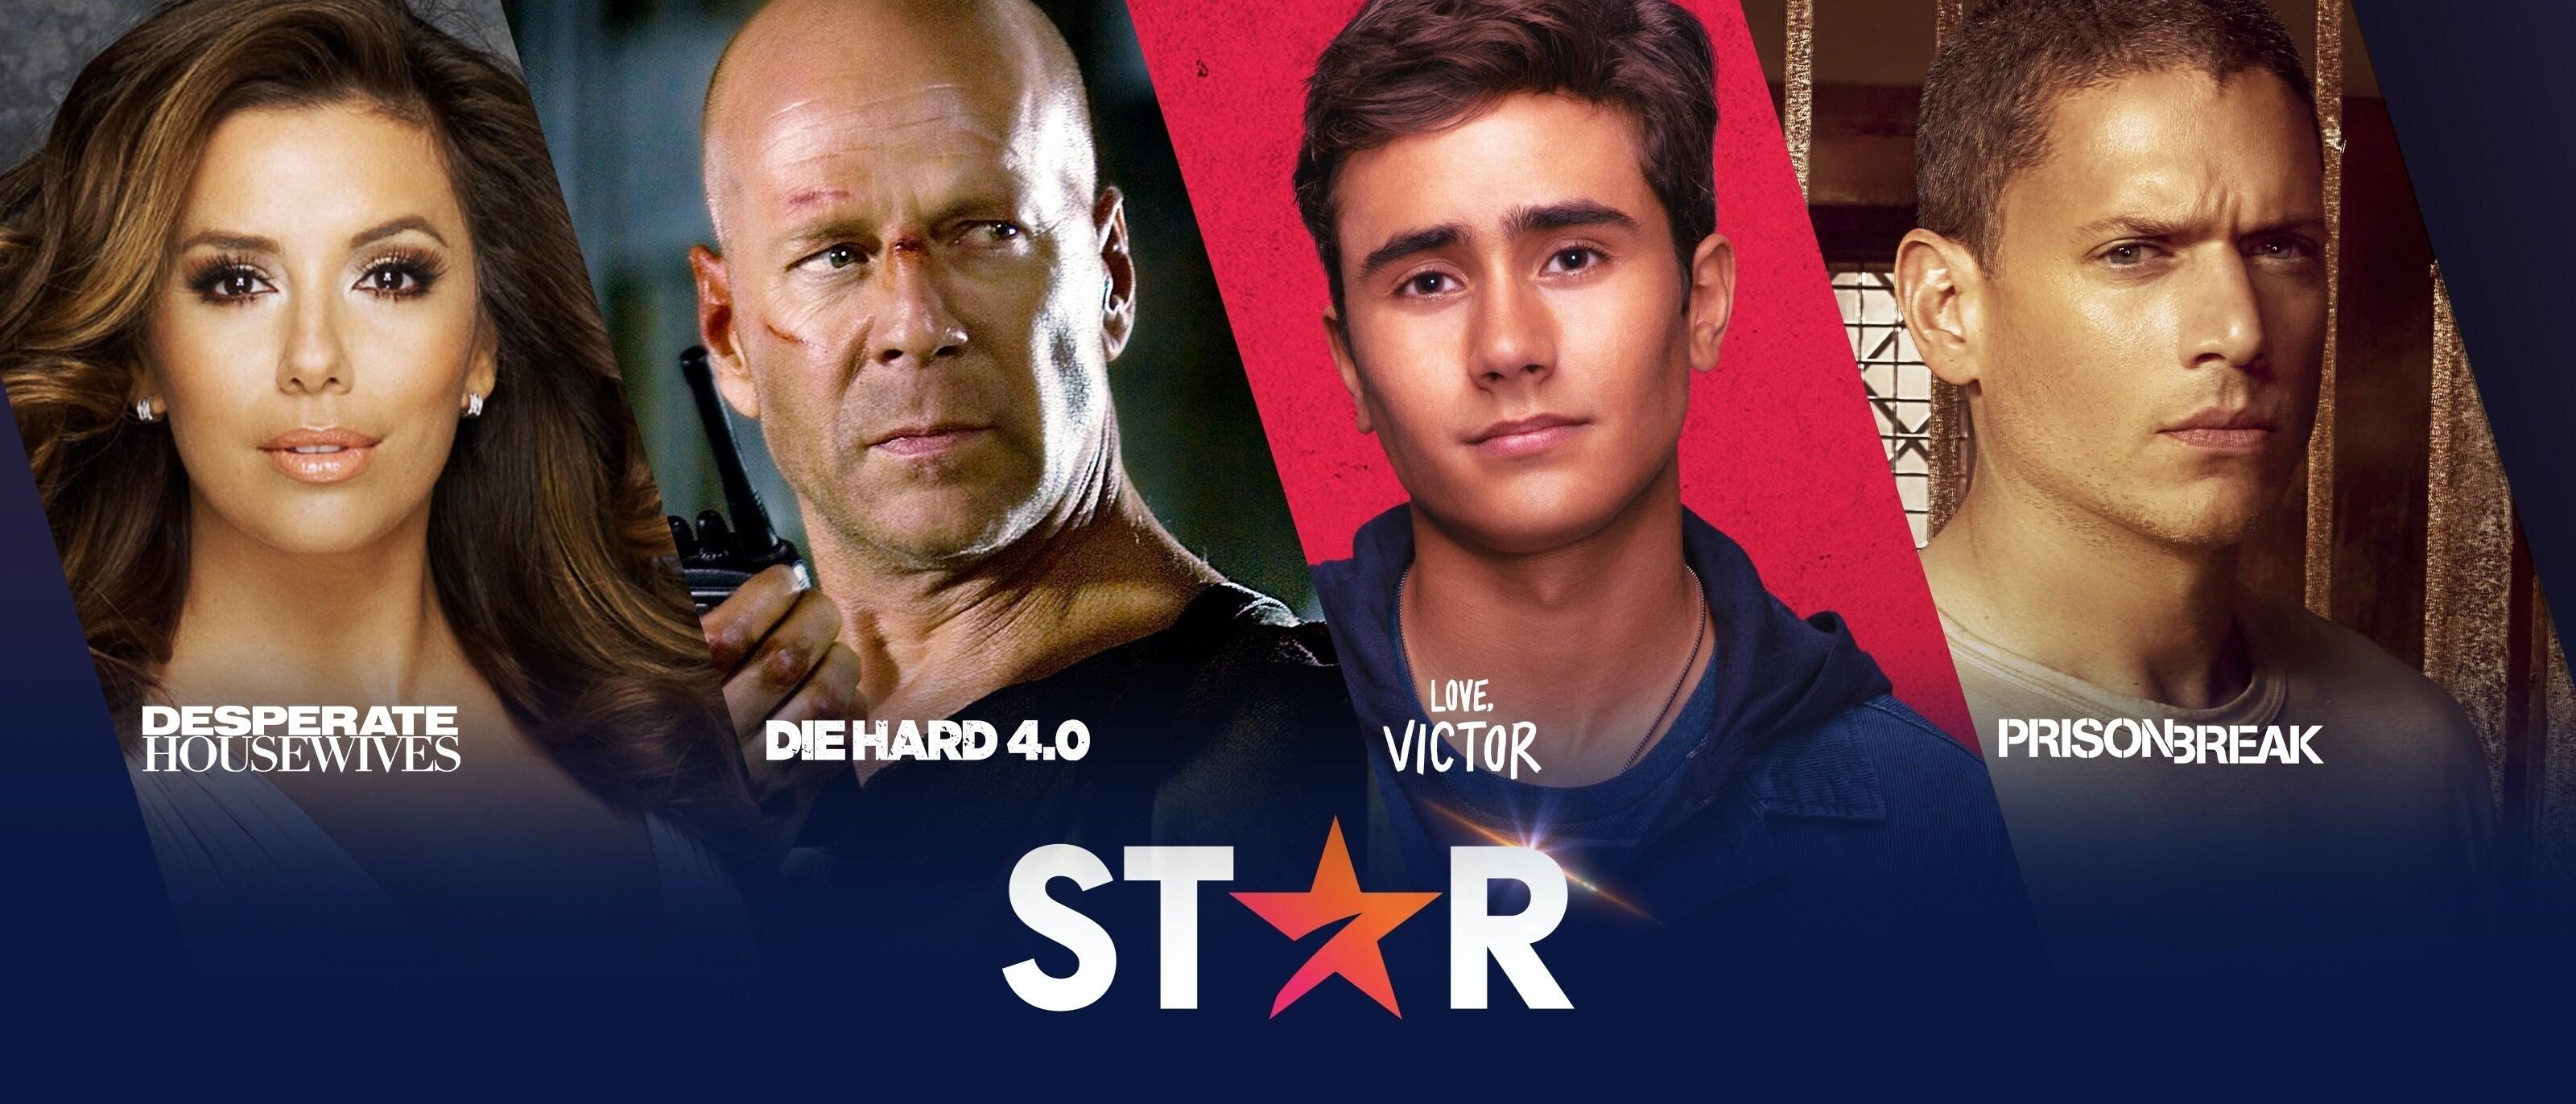 Disney+ presenterar: Star